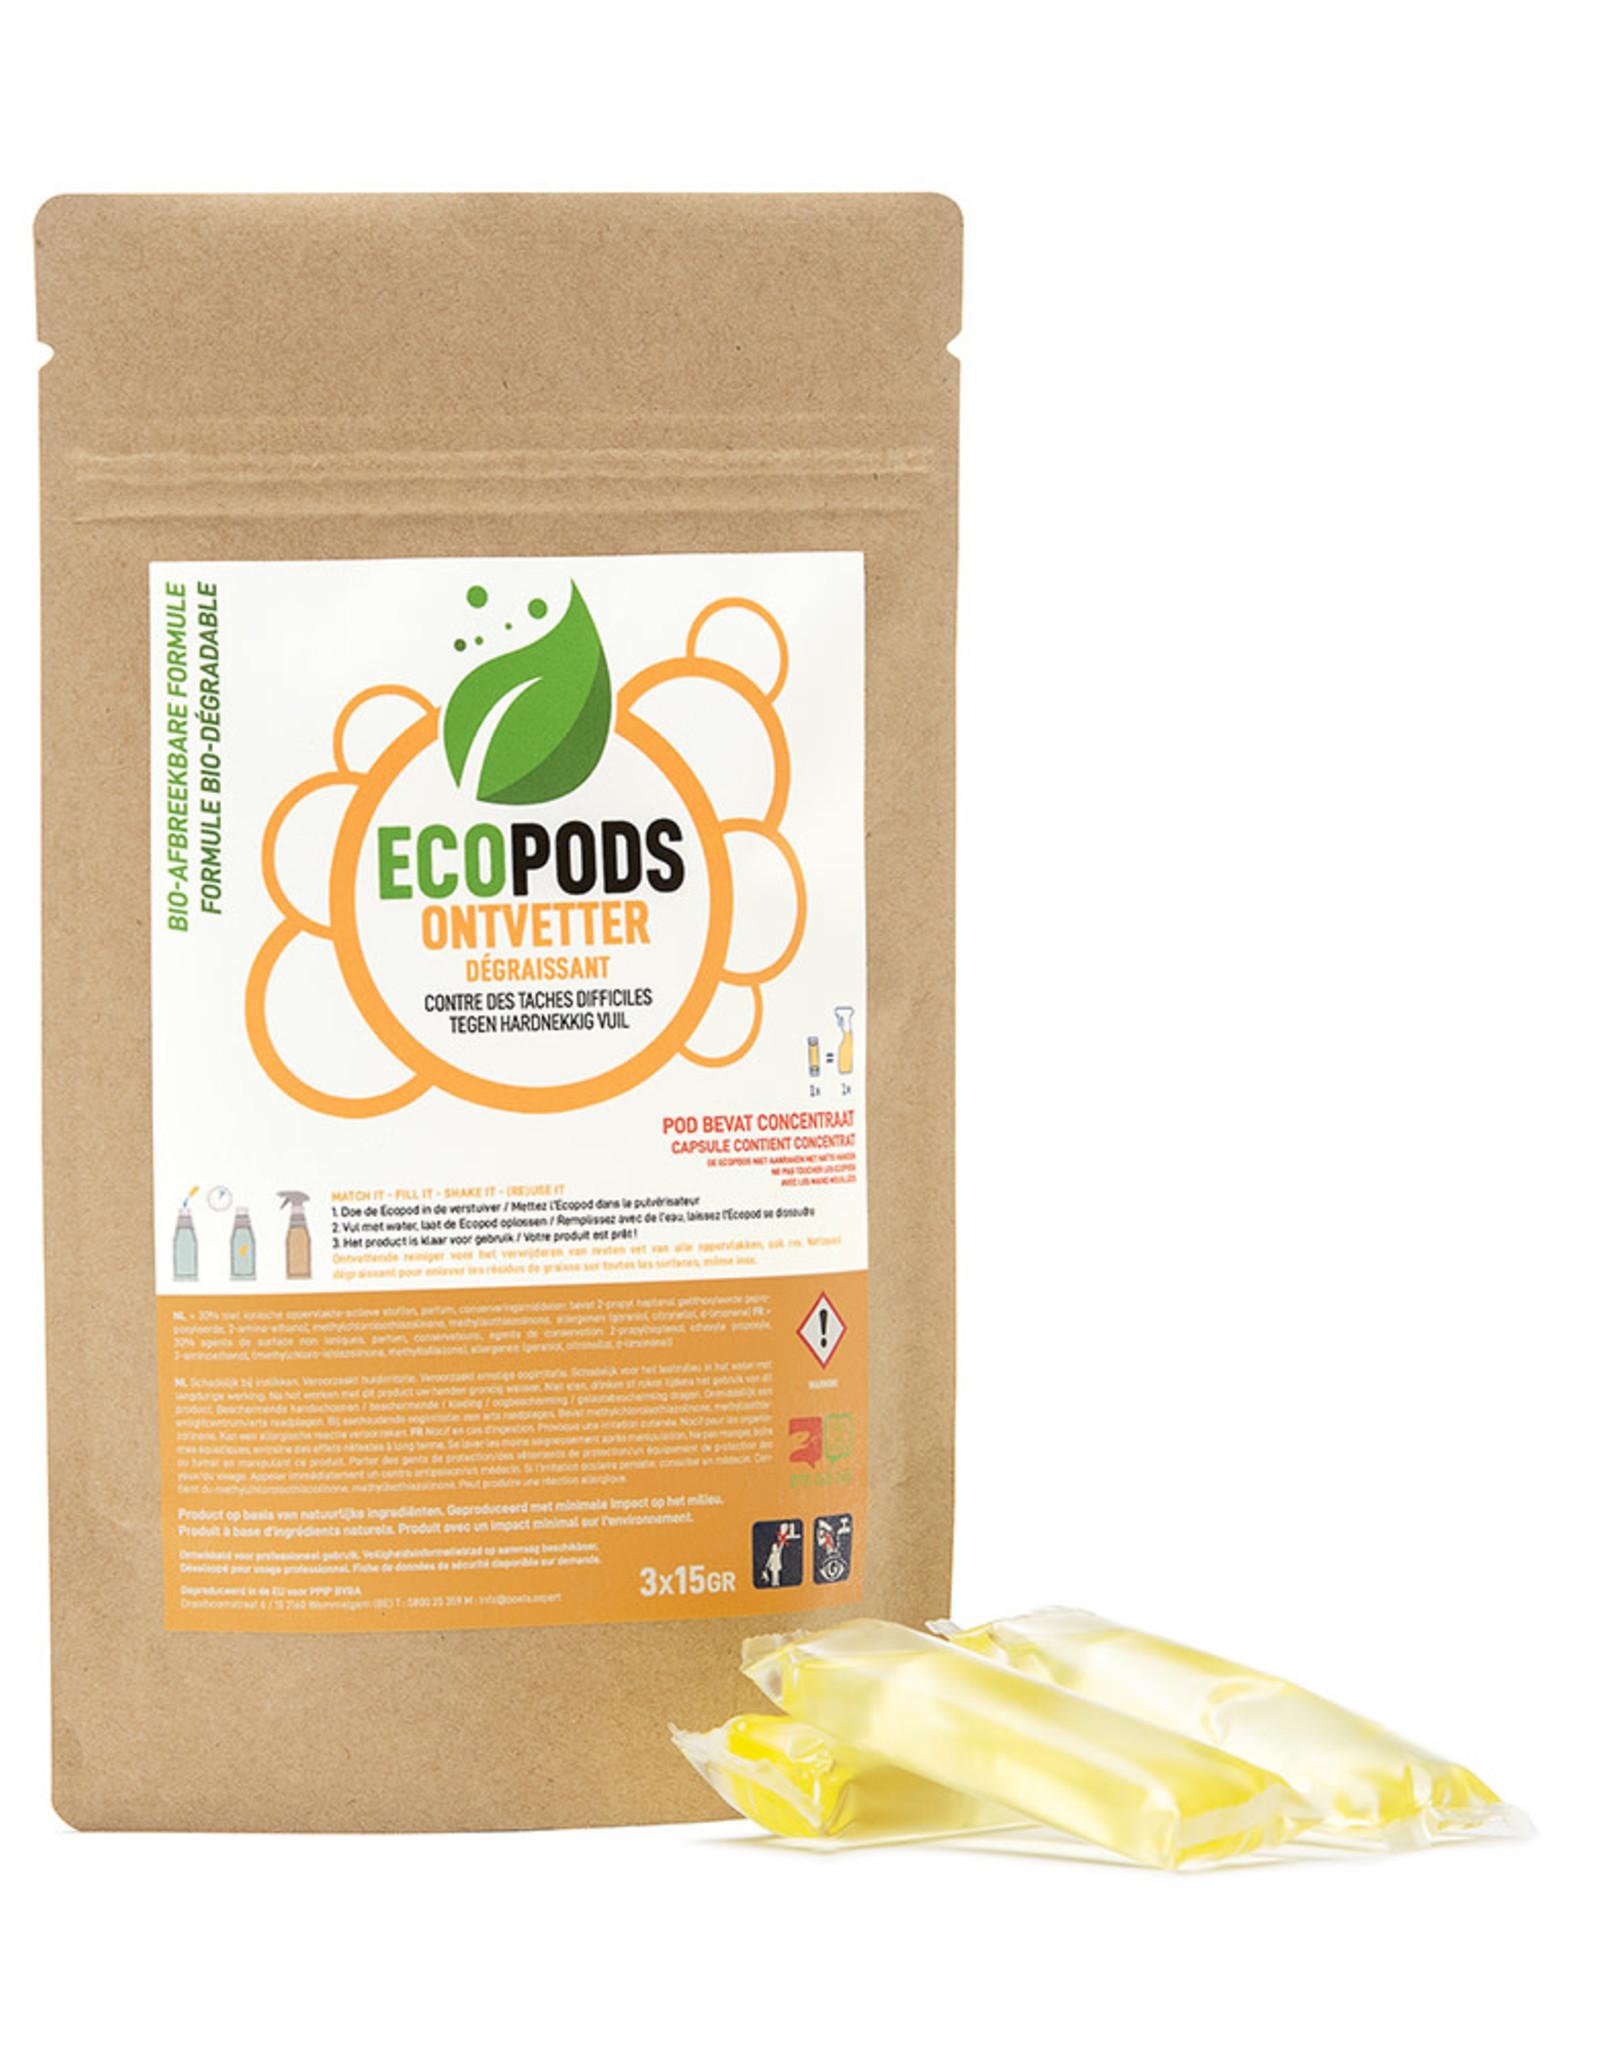 Ecopods Ecopods -  gele pods ontvetter 1 stuk